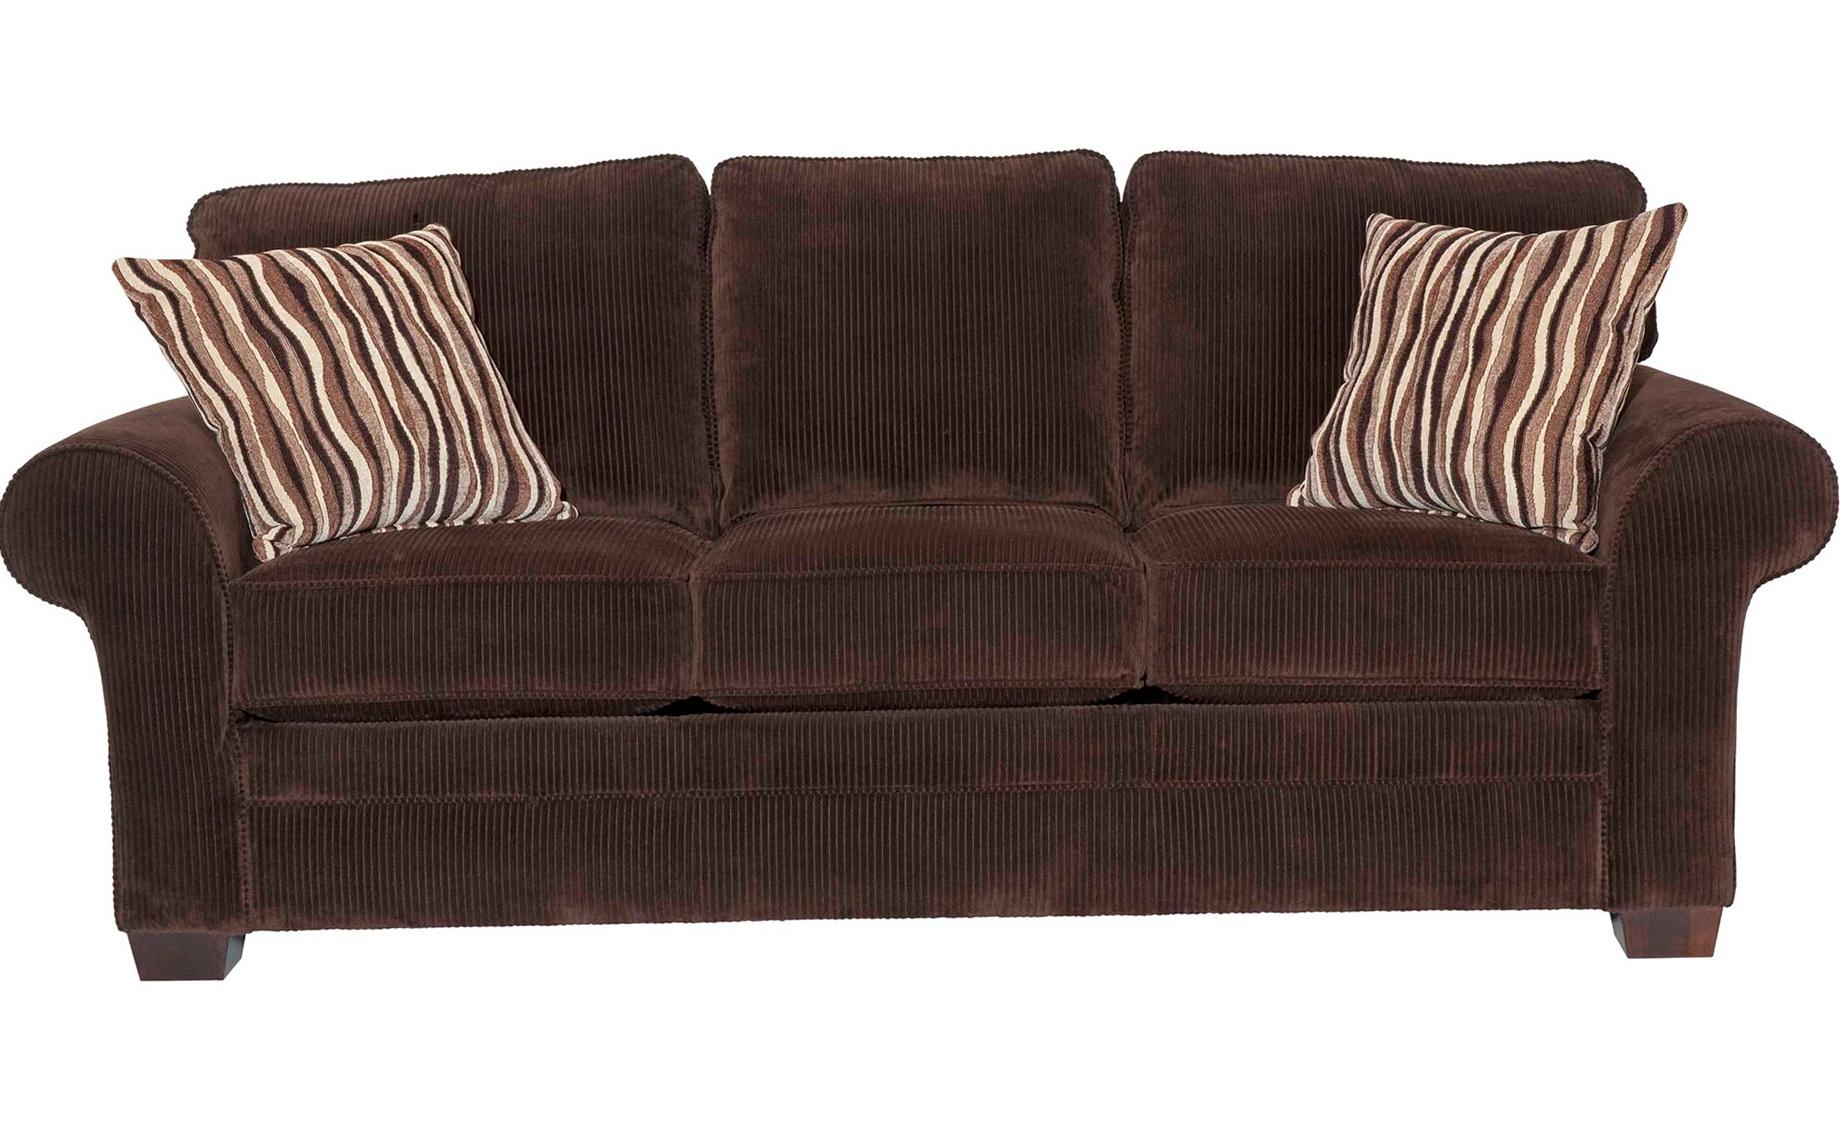 Comfortable Sleeper Sofa Options